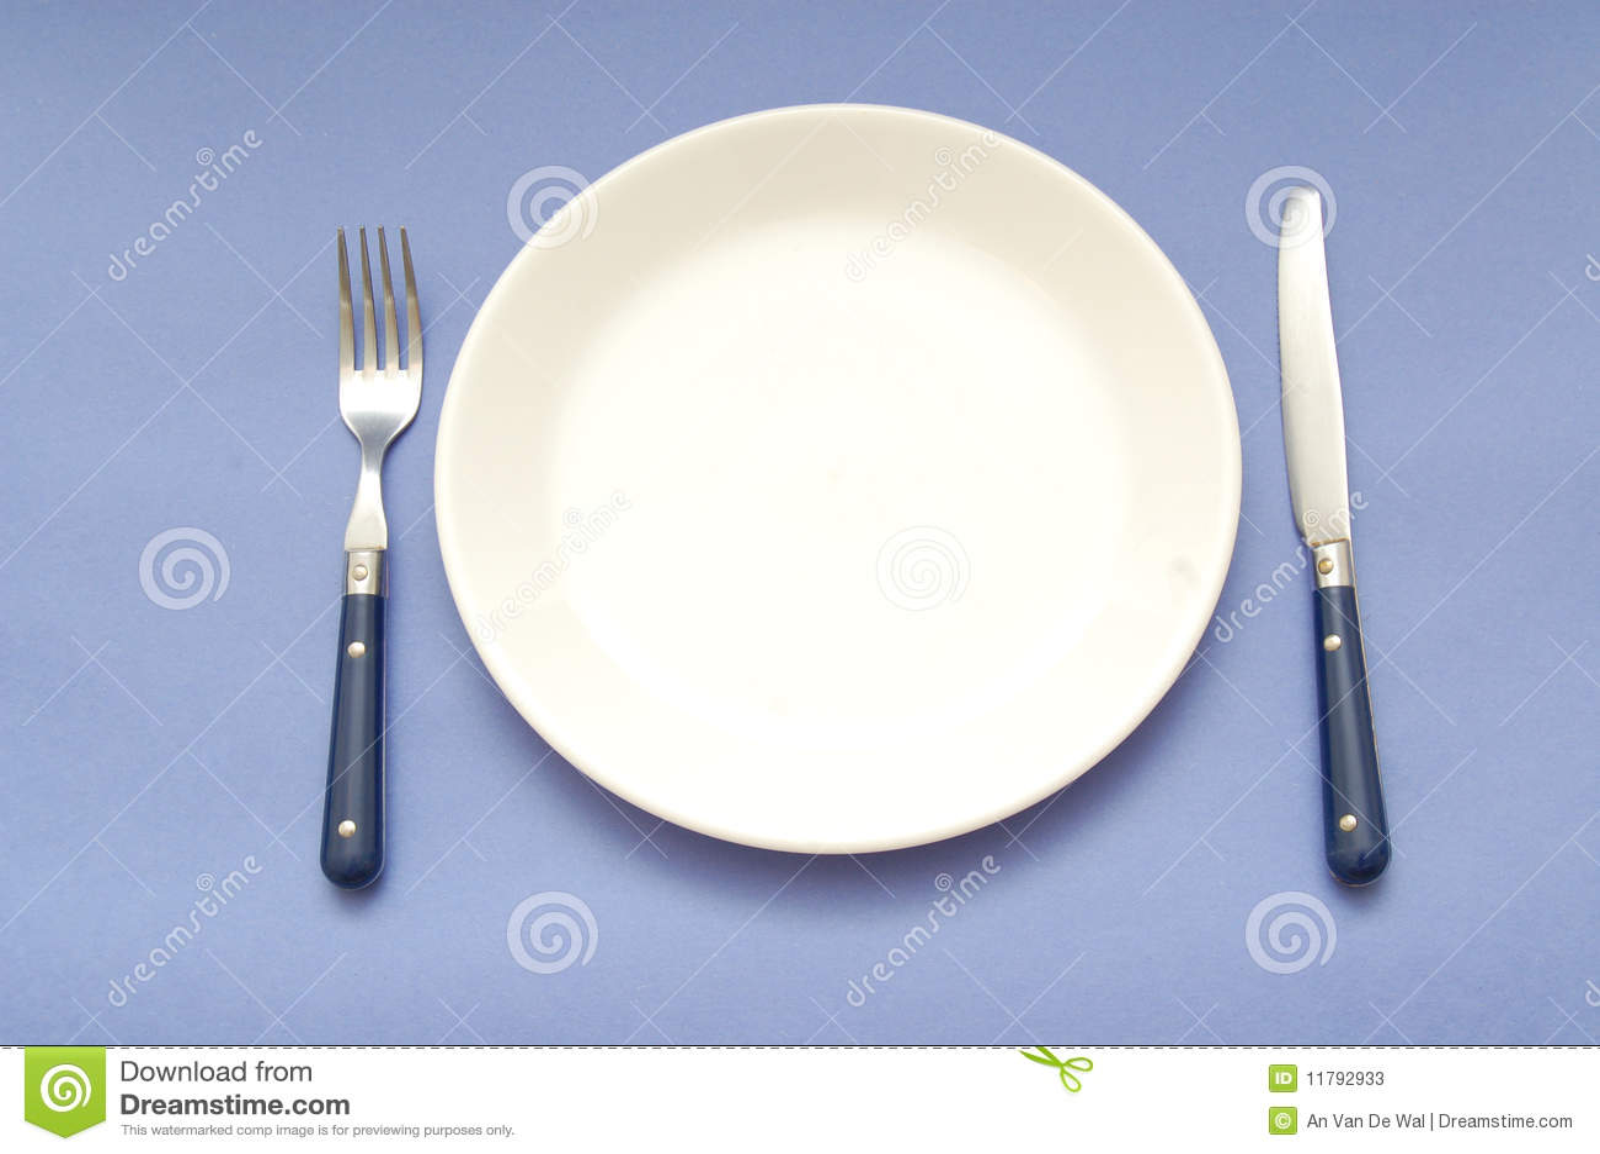 Placa de jantar